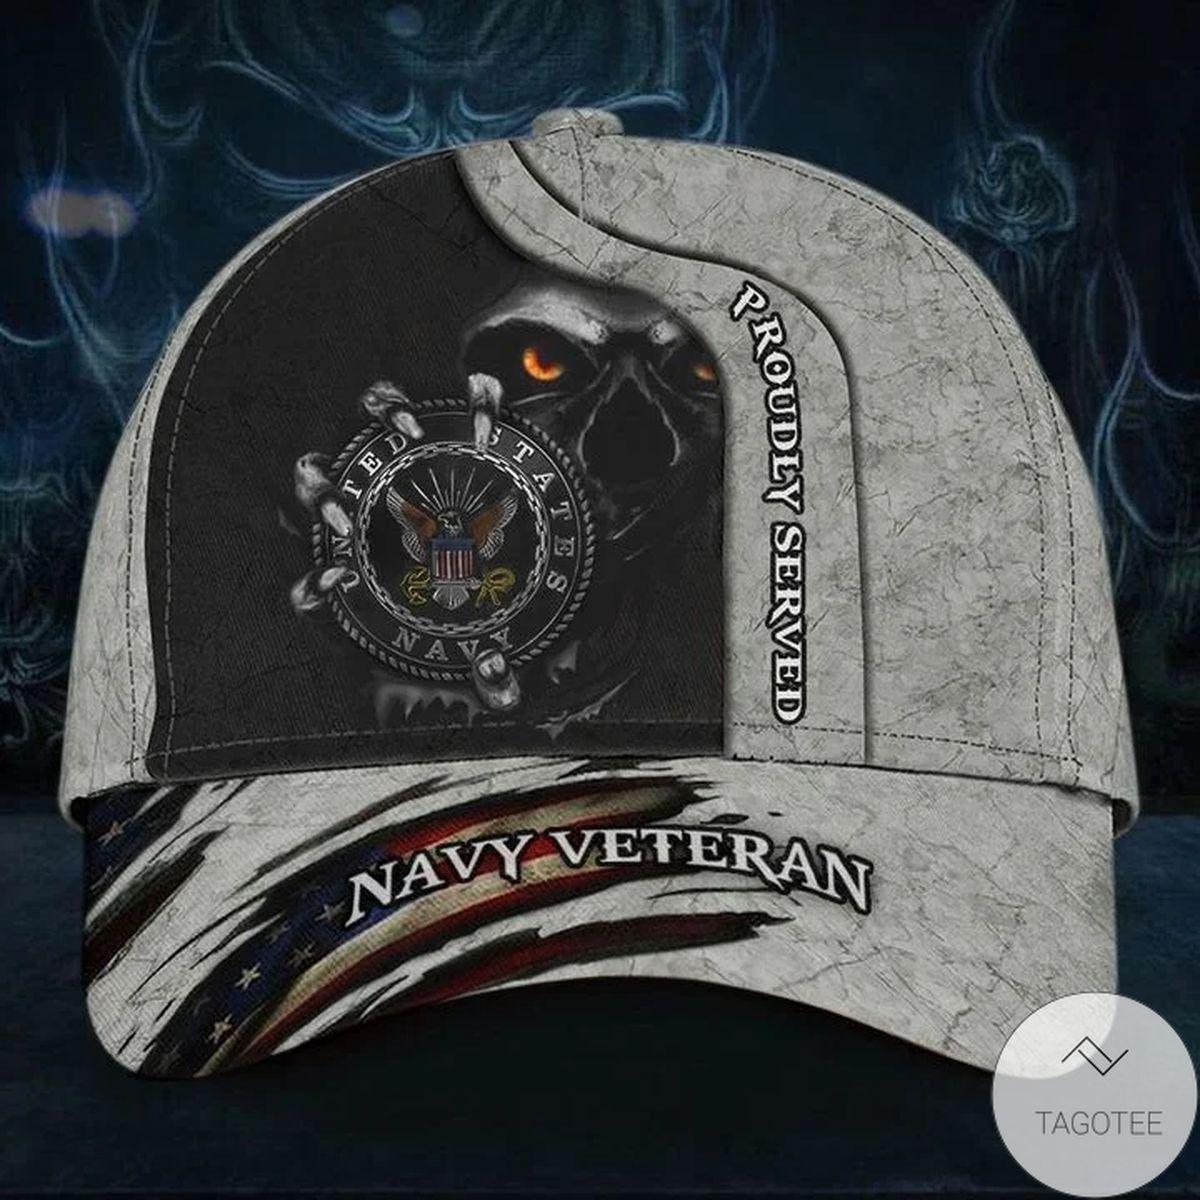 Skull Navy Veteran Proudly Served Hat Unique American Flag Cap Honor Navy Veteran Gifts